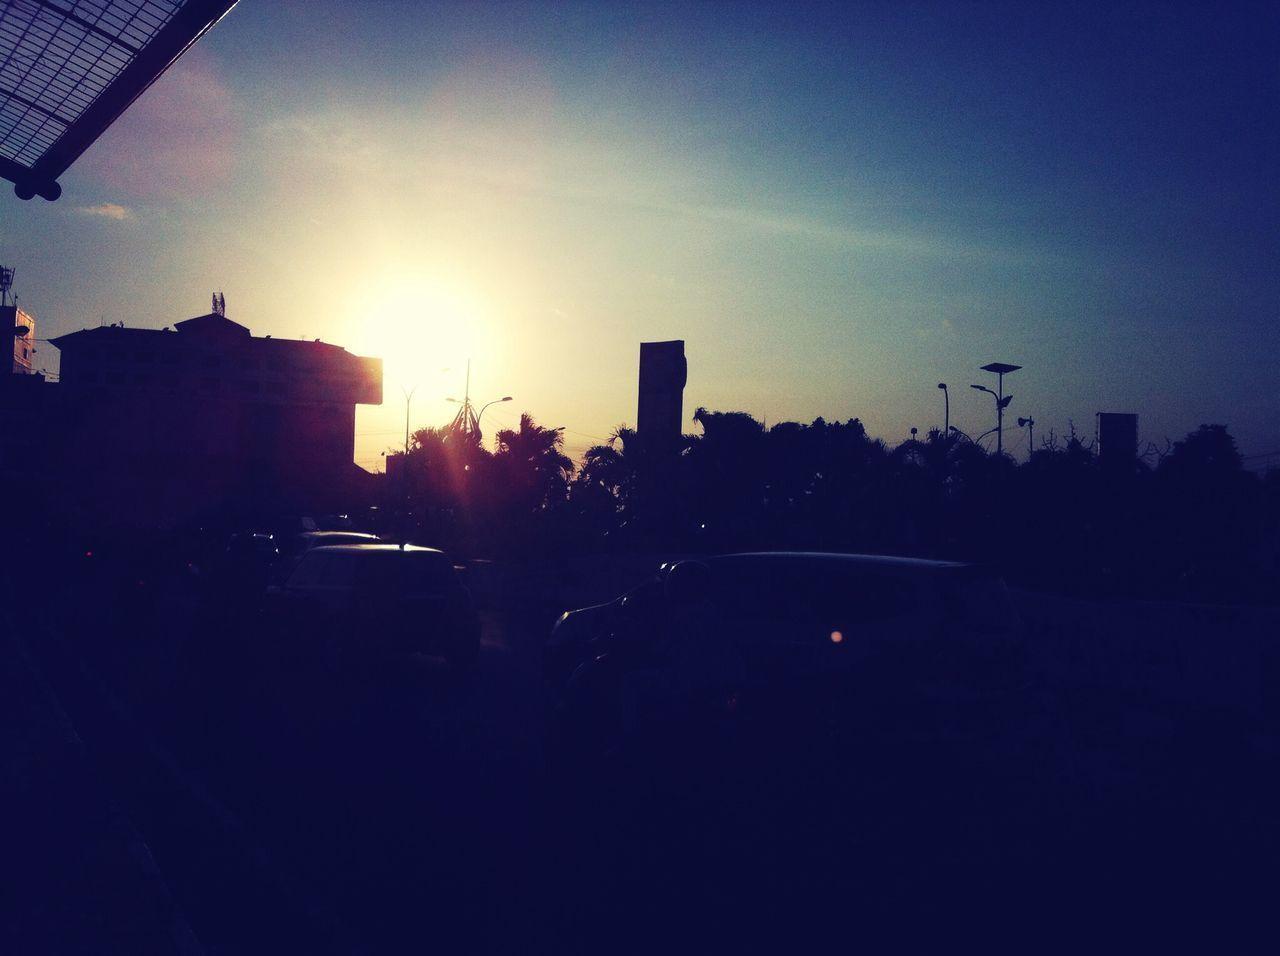 building exterior, architecture, city, built structure, silhouette, sunset, sun, transportation, car, land vehicle, street, sunlight, mode of transport, clear sky, city life, road, sky, lens flare, sunbeam, city street